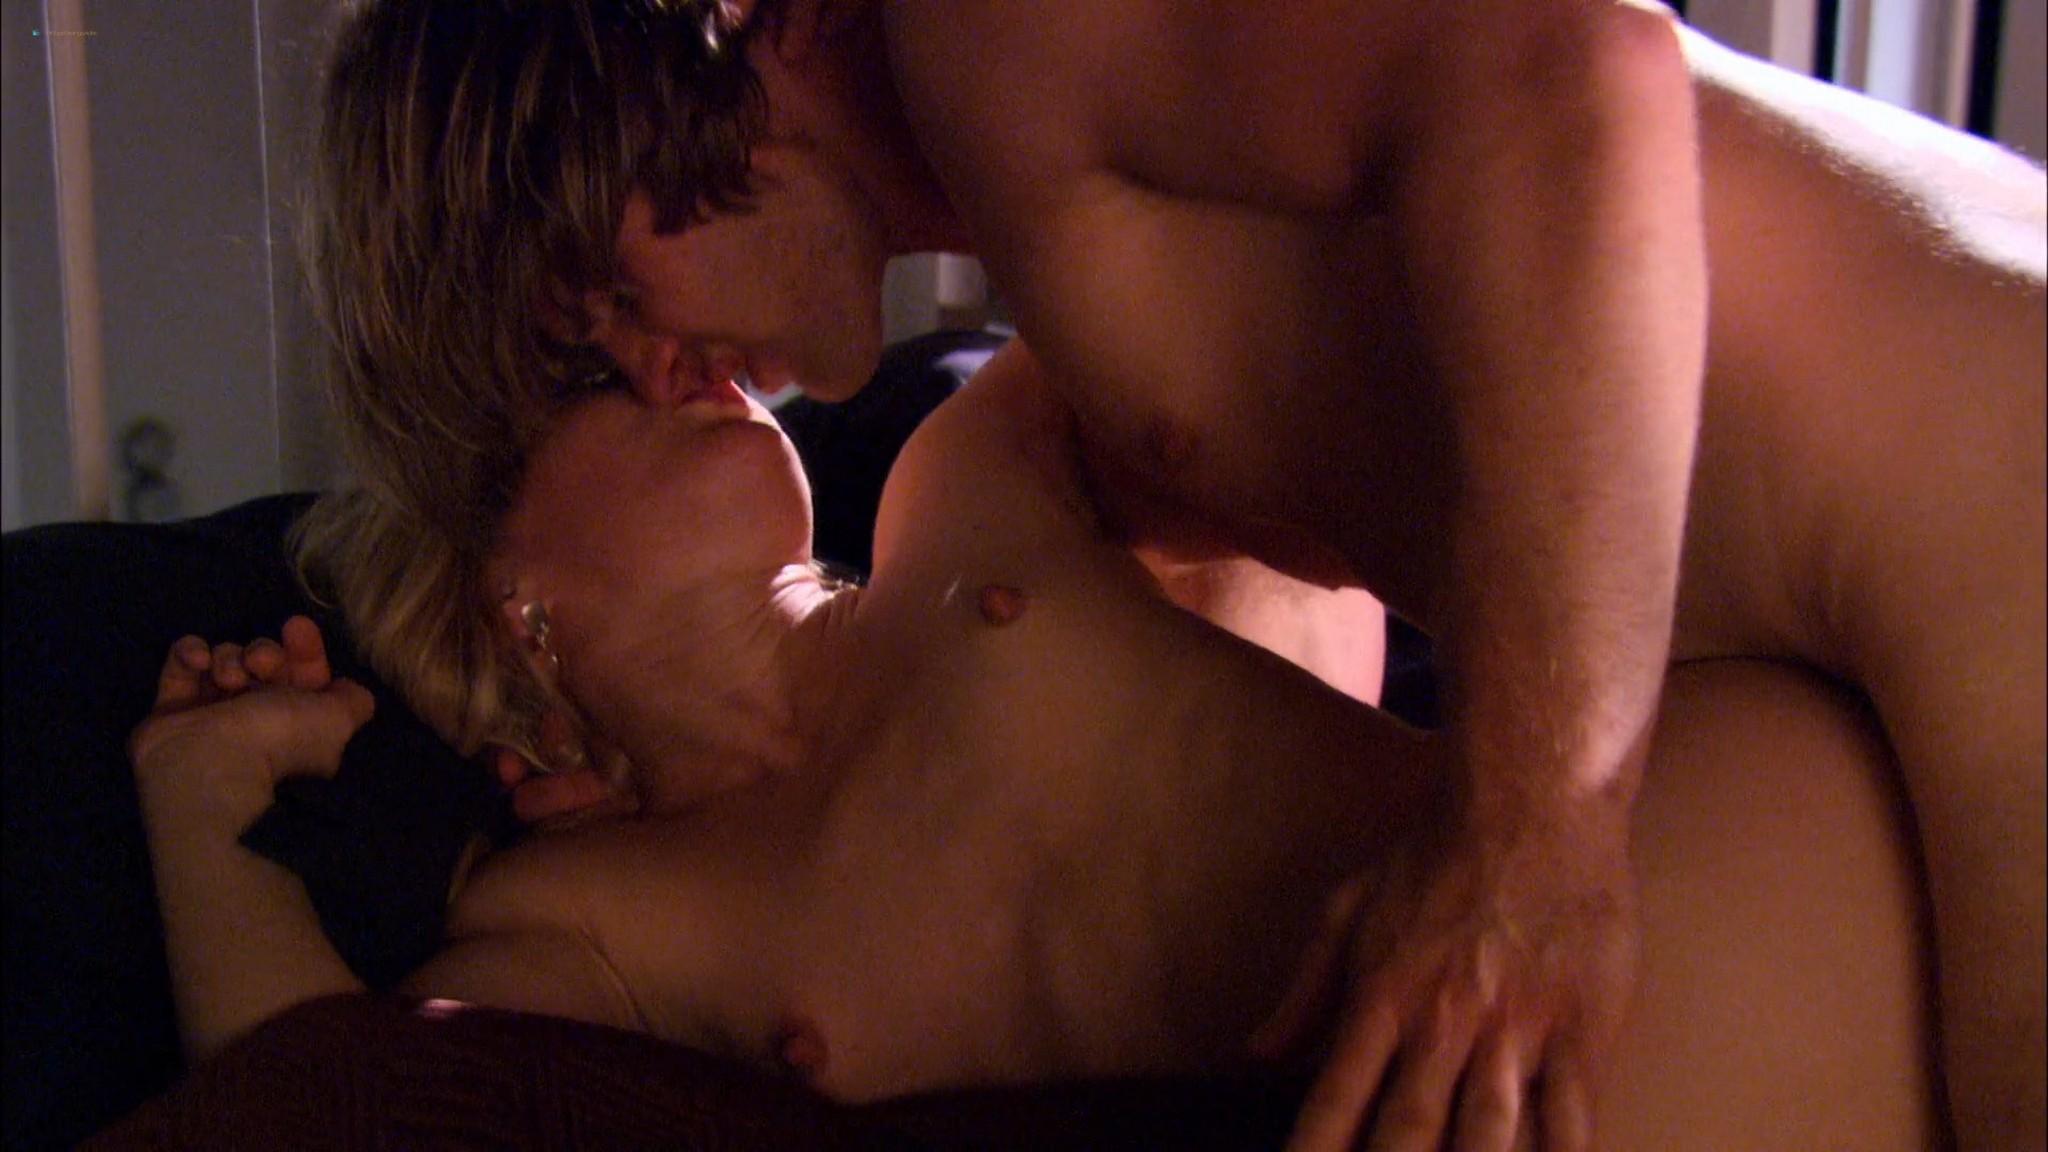 Lana Tailor nude sex Denise Cobar Jennifer Korbin all nude and hot sex Lingerie 2010 s2e7 HD 1080p Web 16